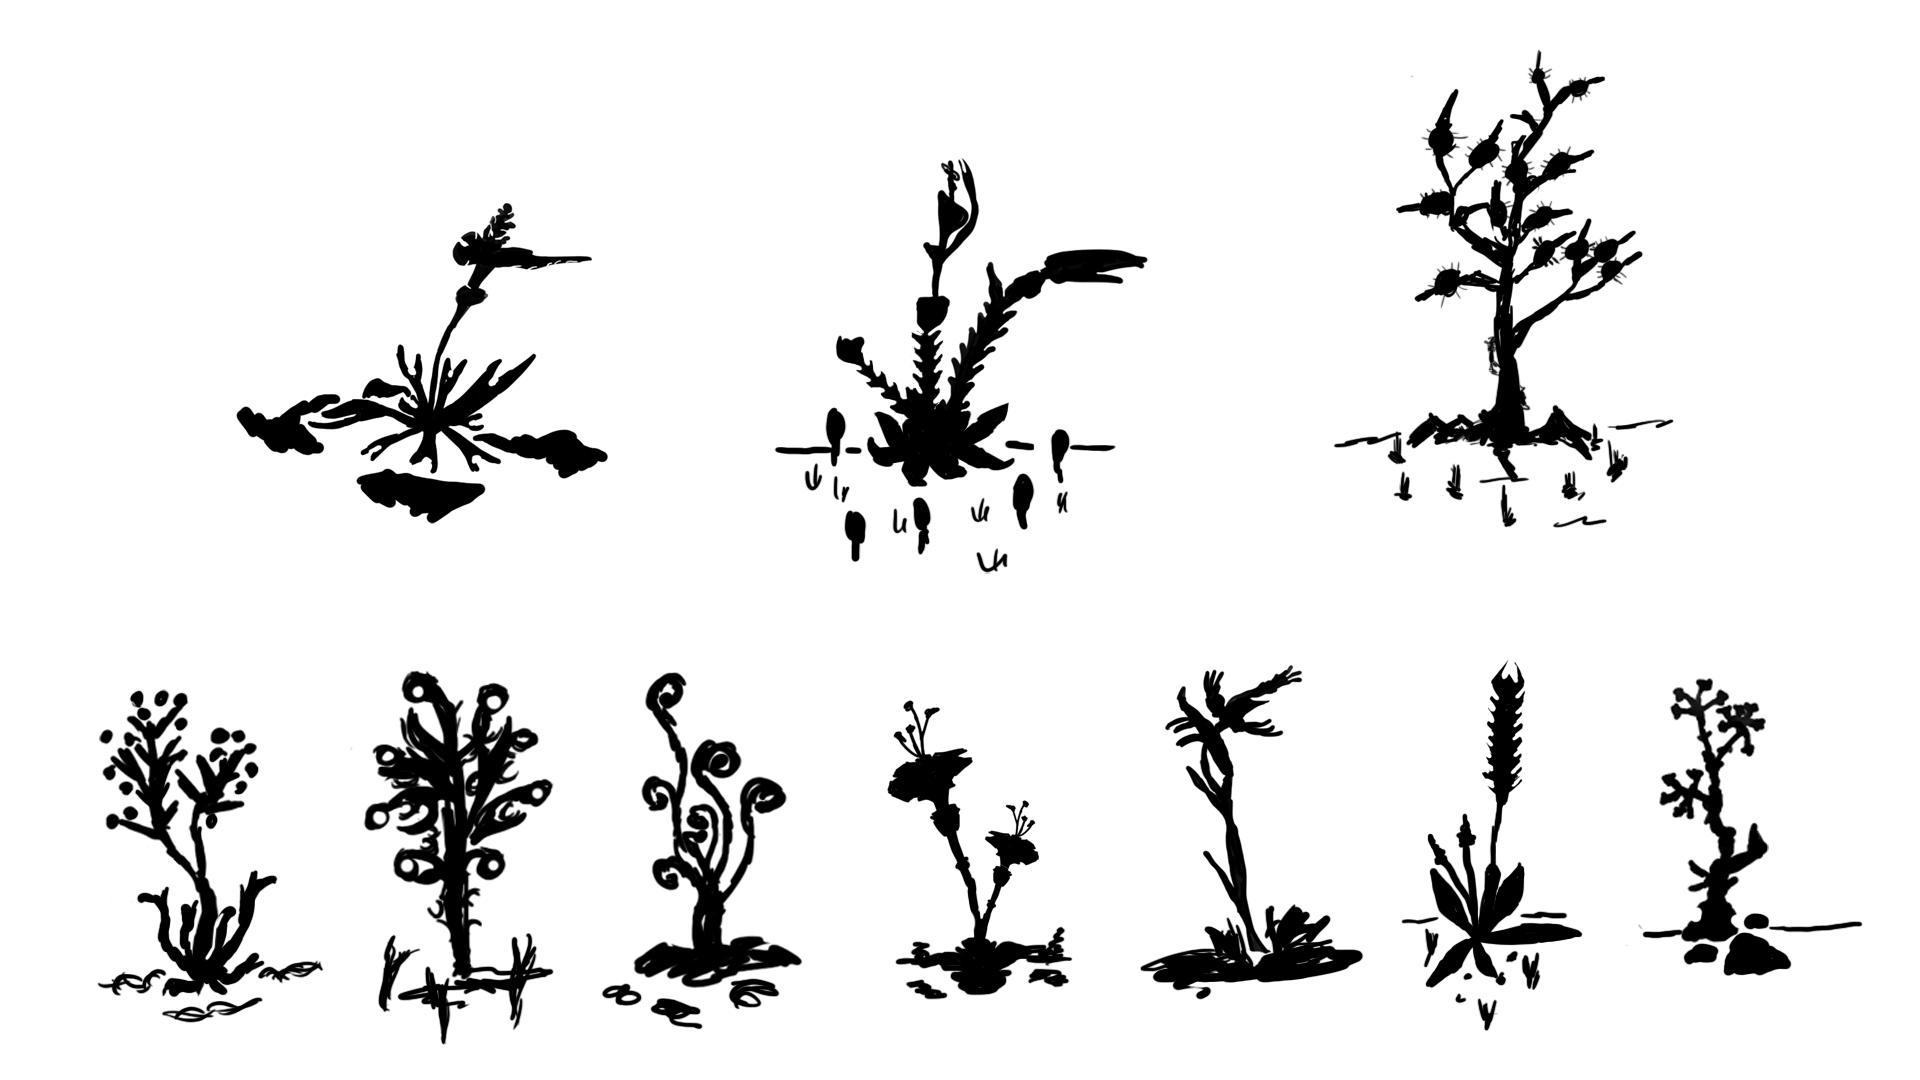 Pflanzen-Konzepte_1